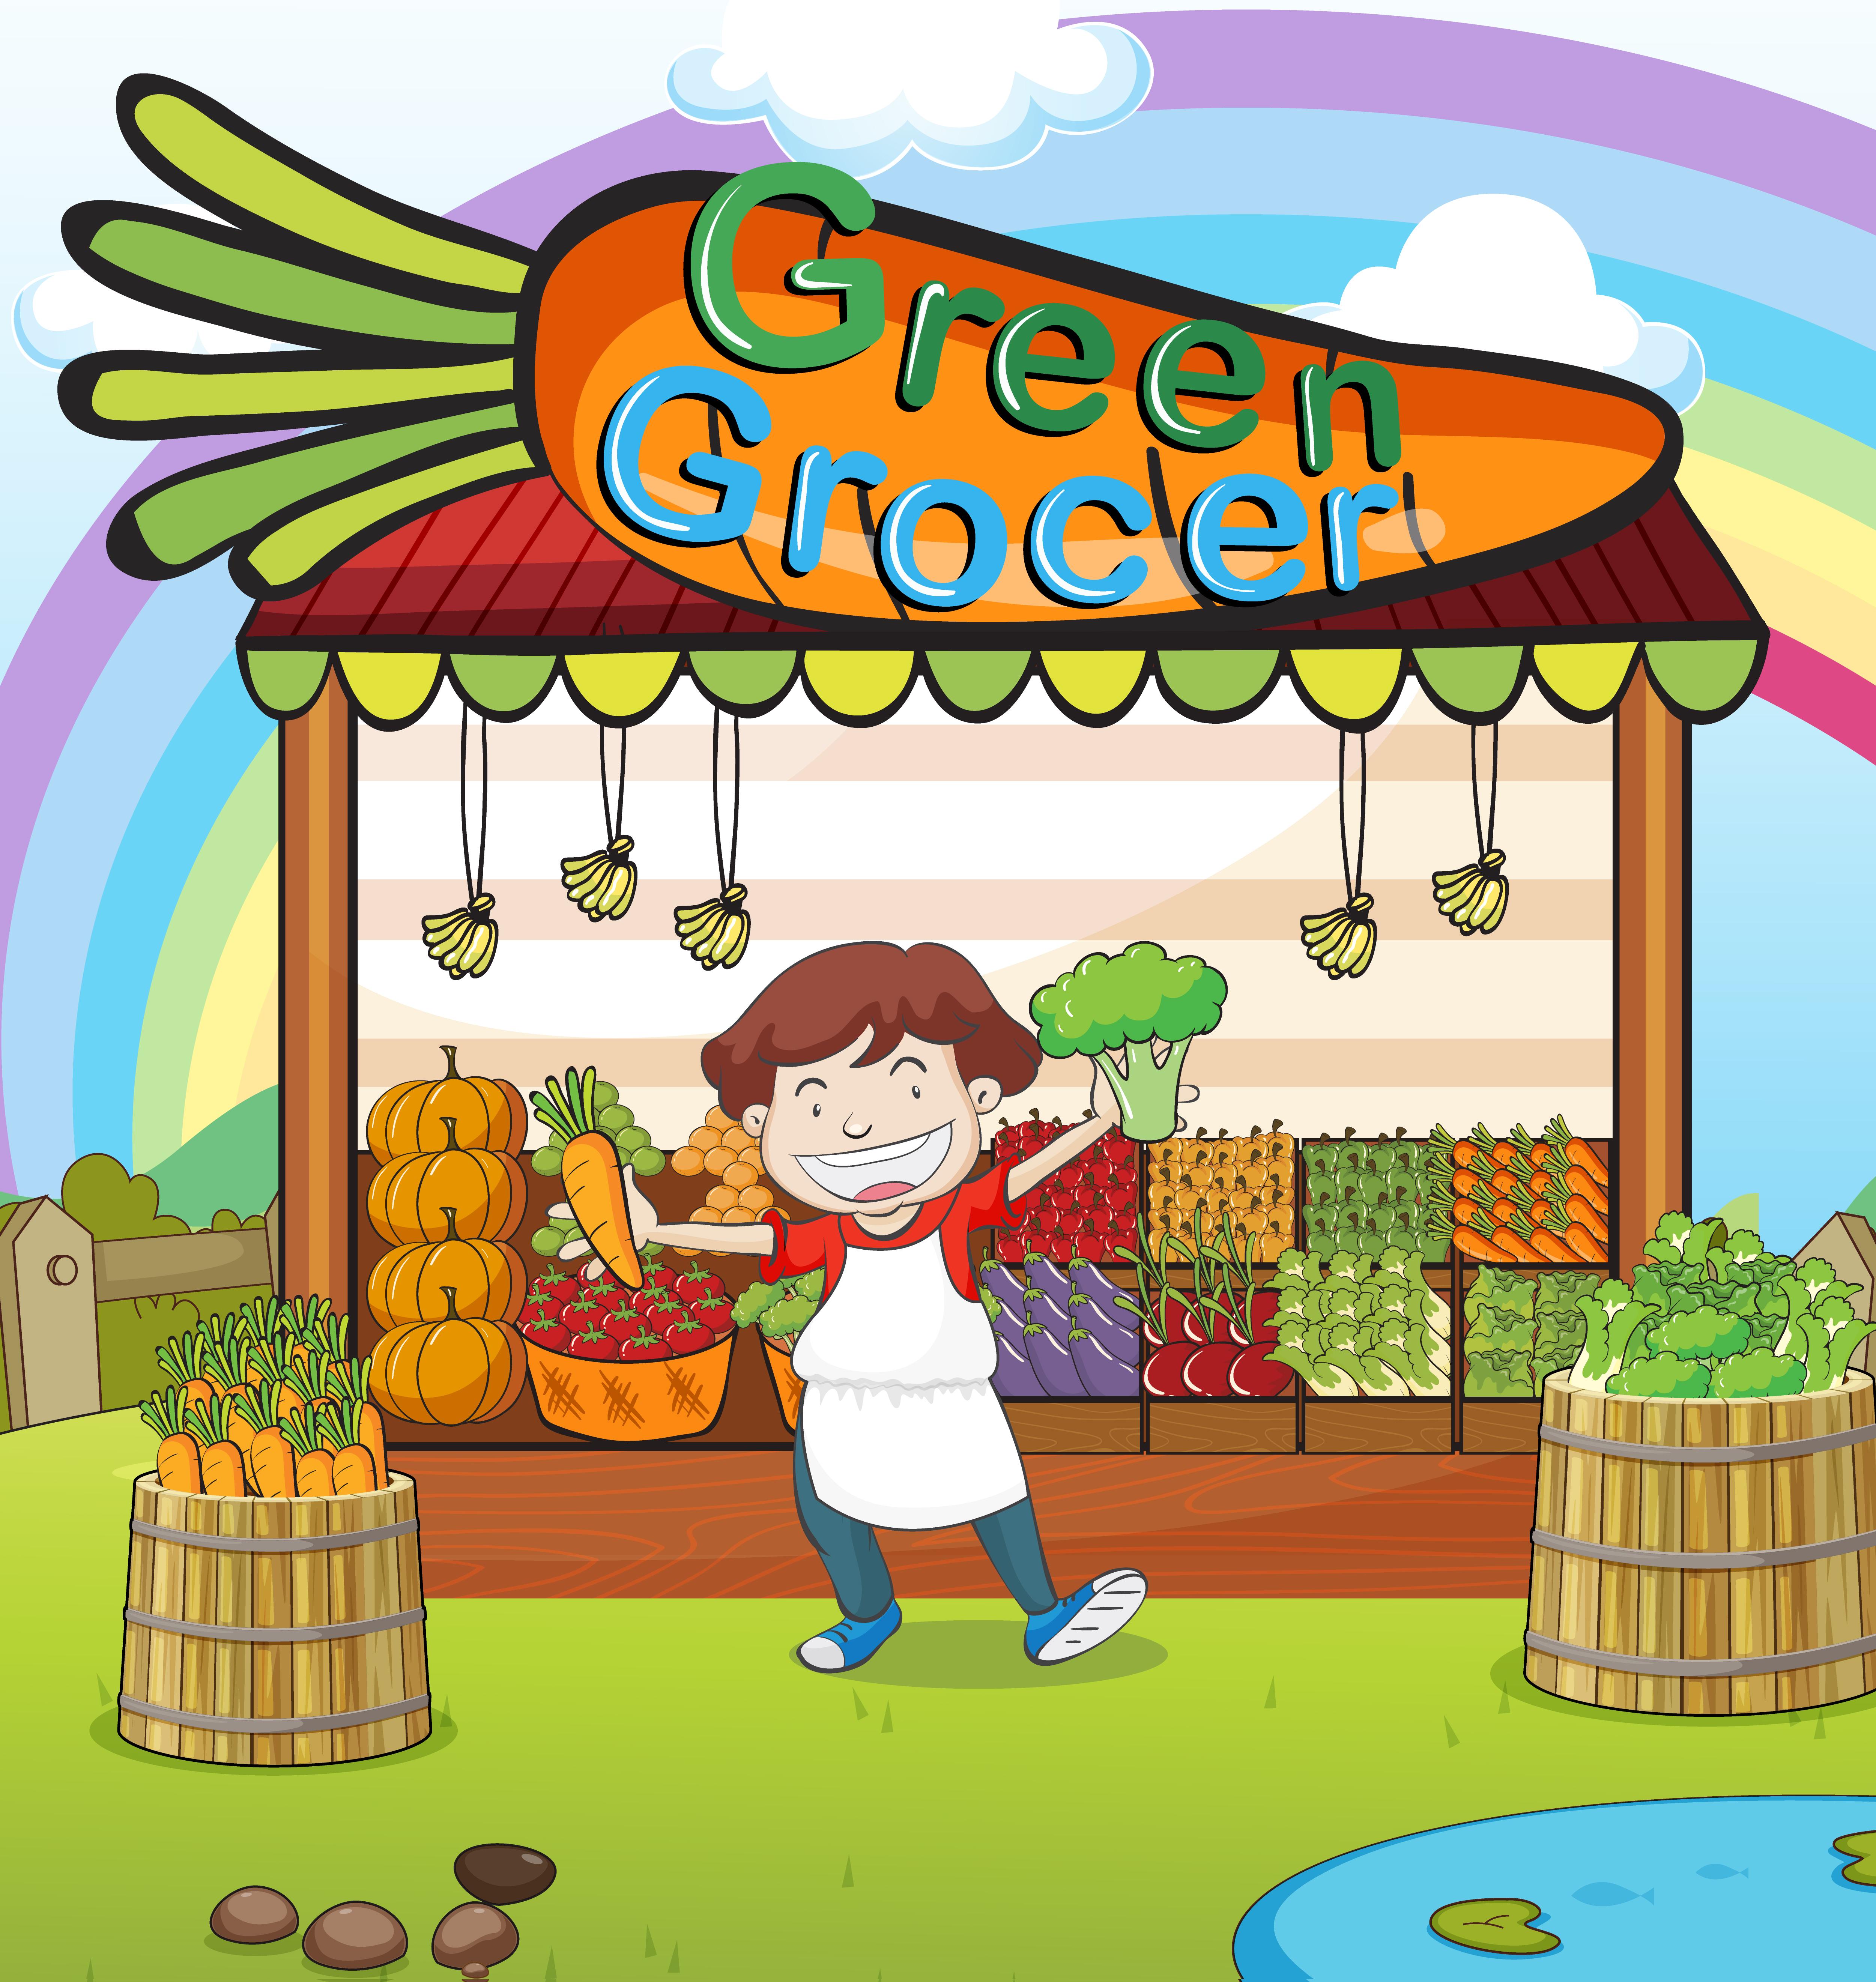 slot mashinasi greengrocer bepul oynaydi